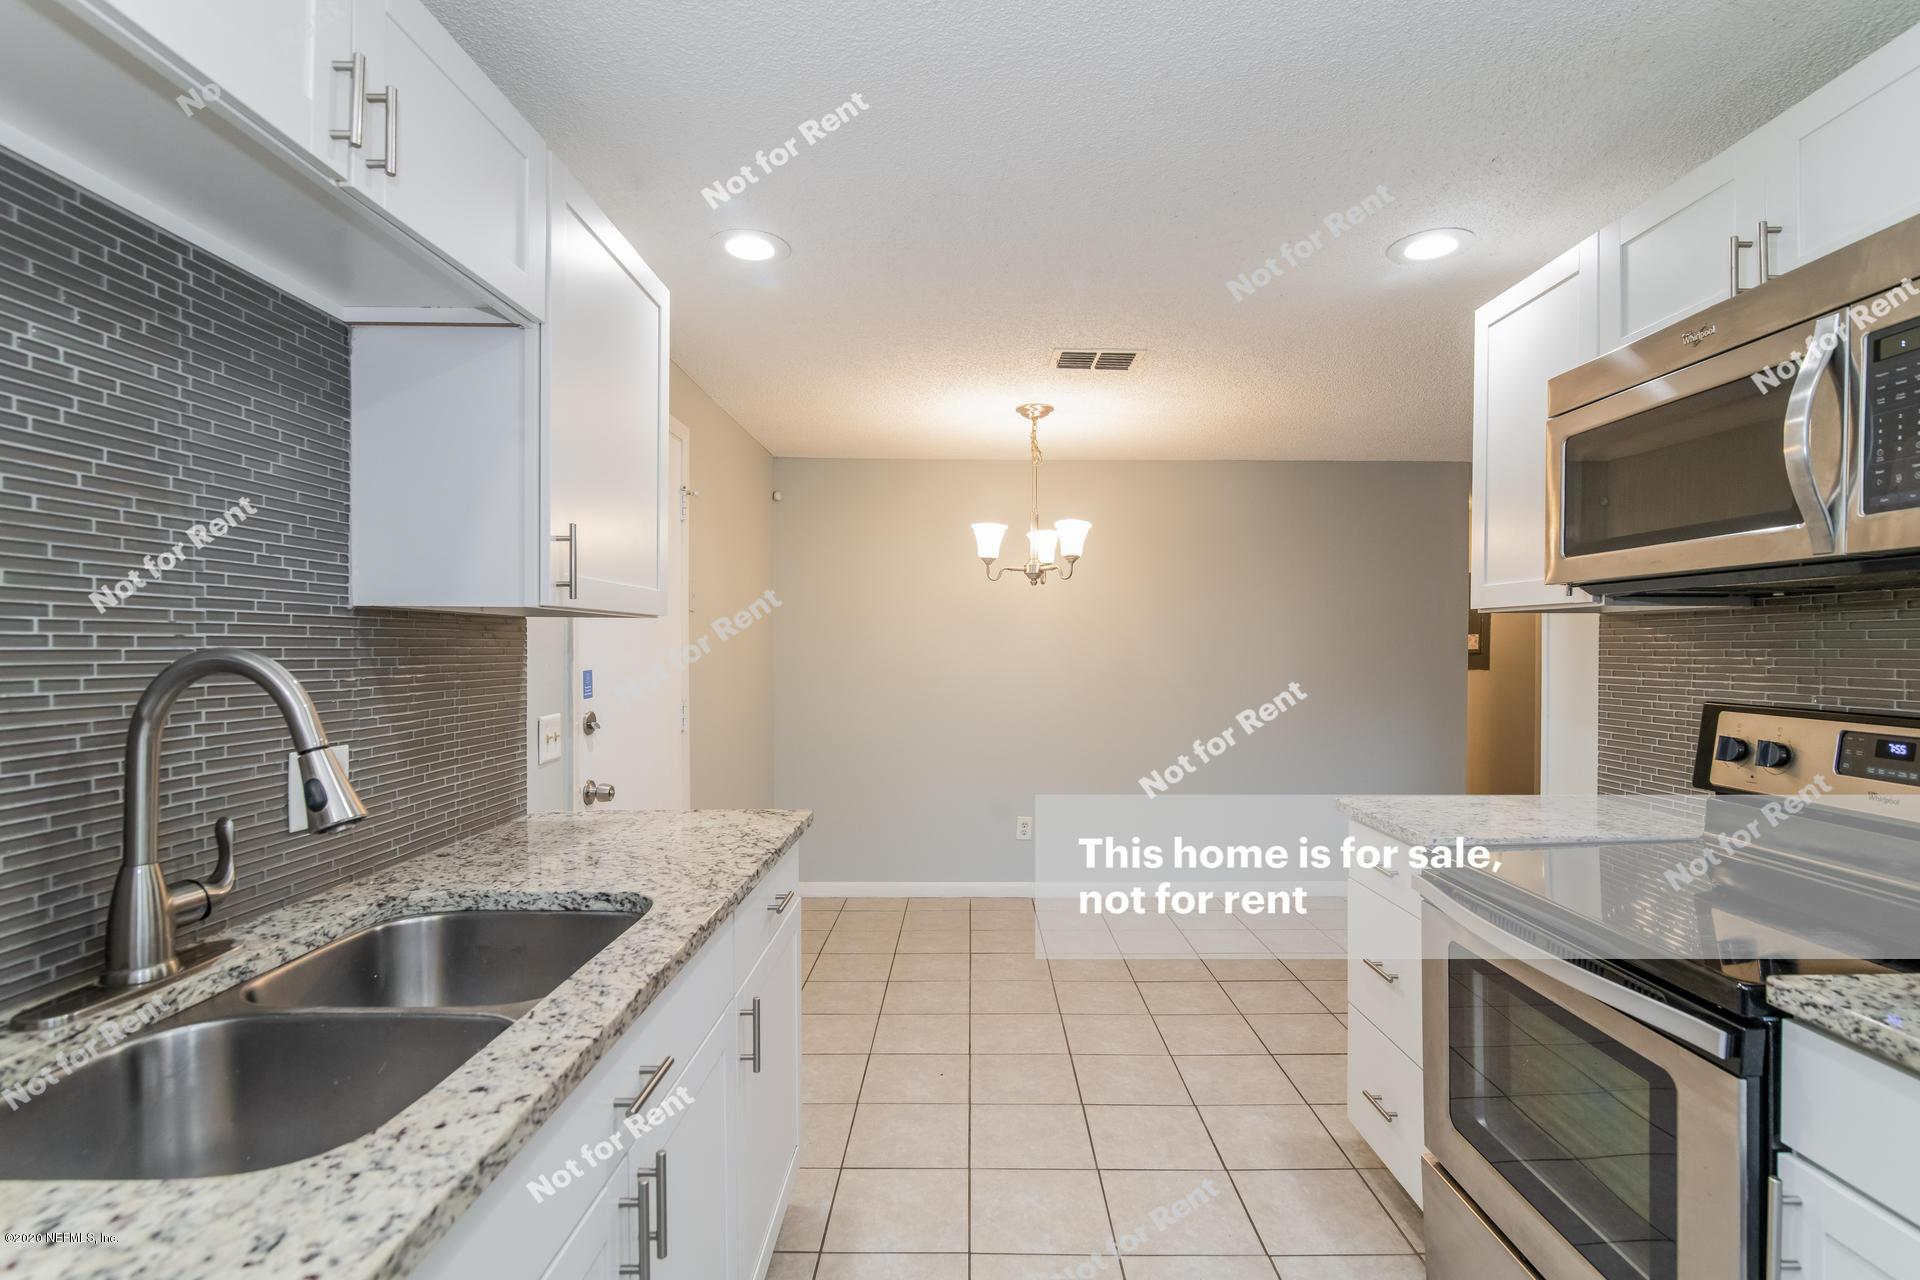 5813 JASON, JACKSONVILLE, FLORIDA 32244, 3 Bedrooms Bedrooms, ,2 BathroomsBathrooms,Residential,For sale,JASON,1080022